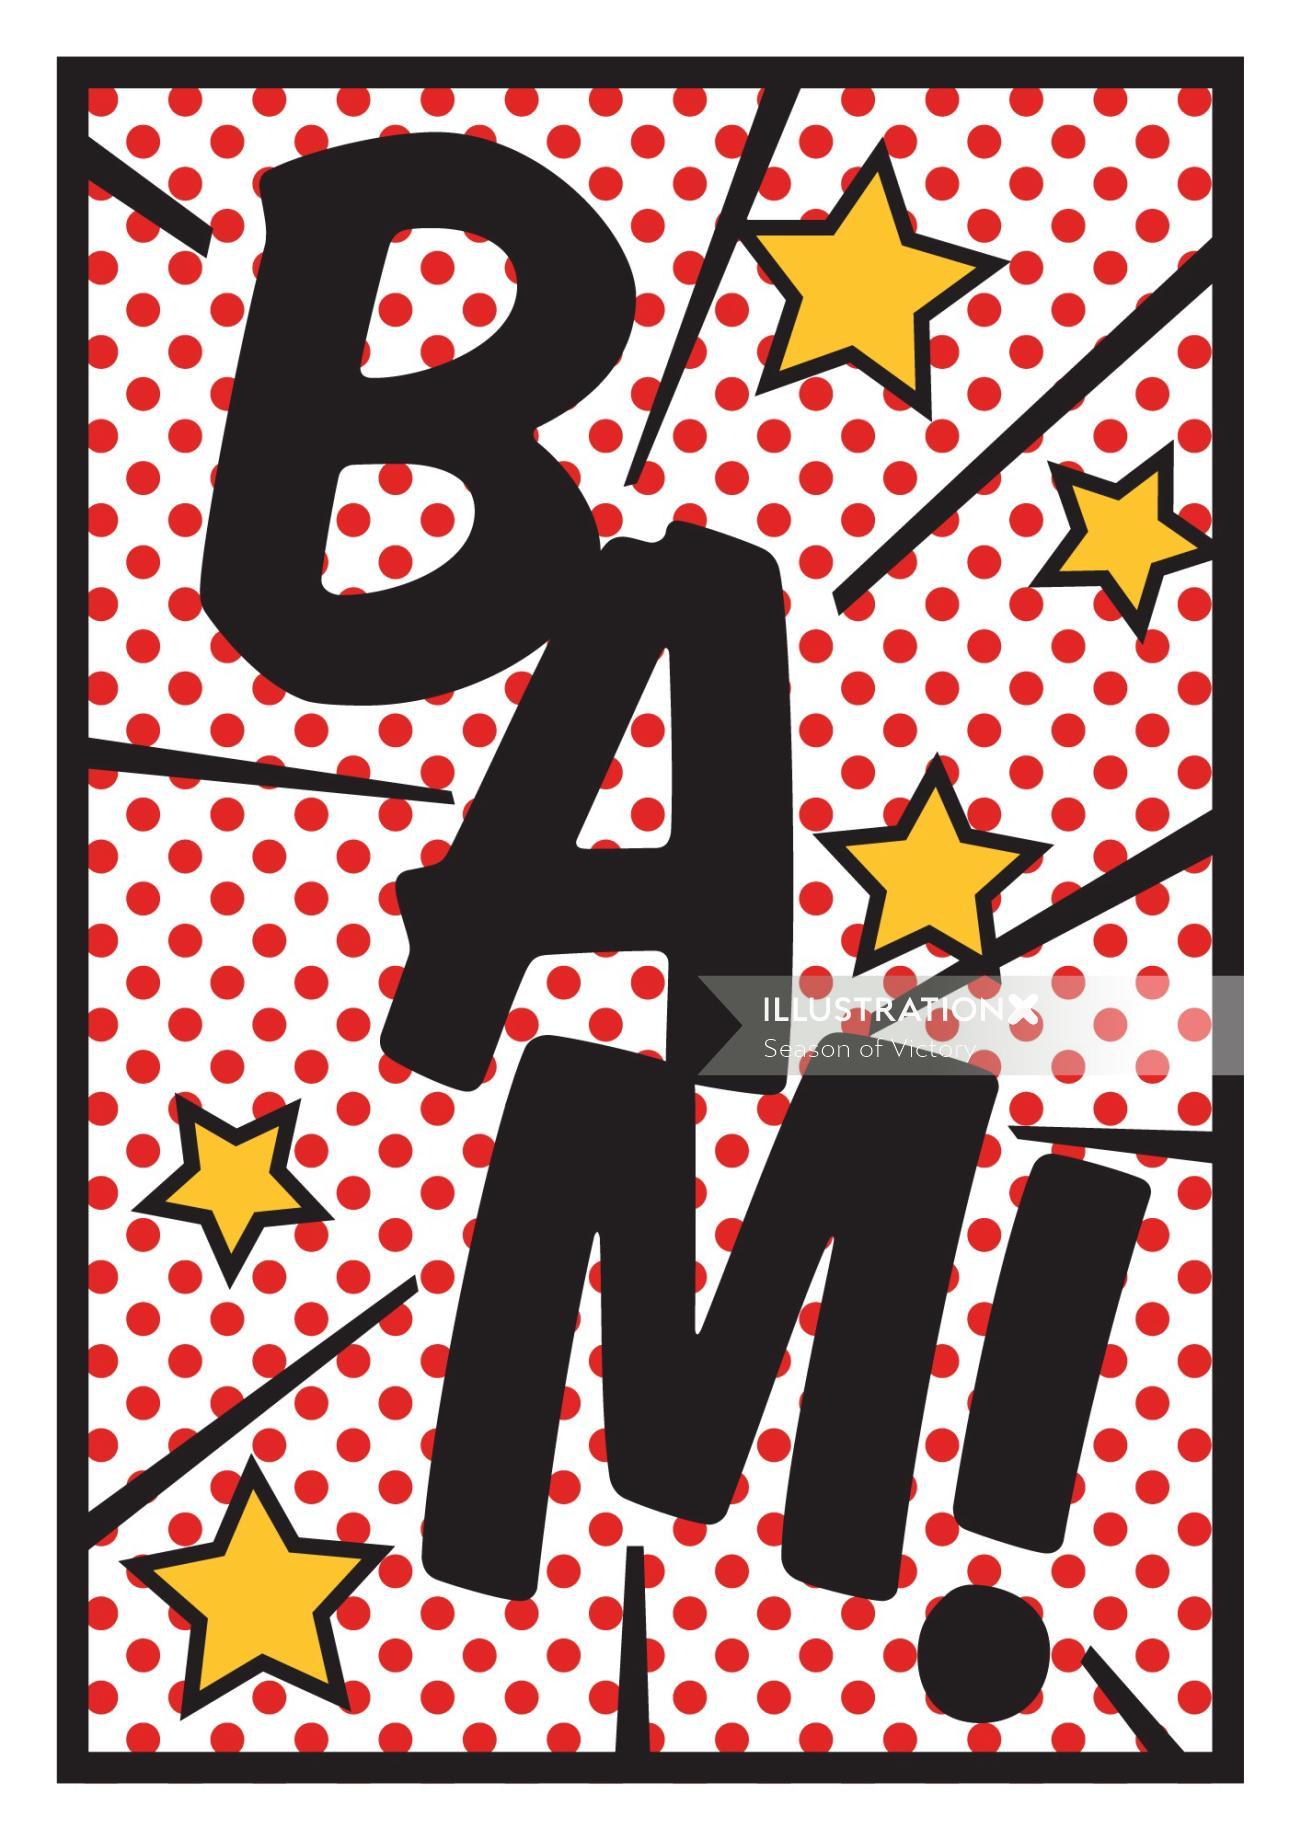 bam, comic, cartoon, comicbook, popart, pop graphic, pop, boom, superhero, hero, comic strip, cartoo